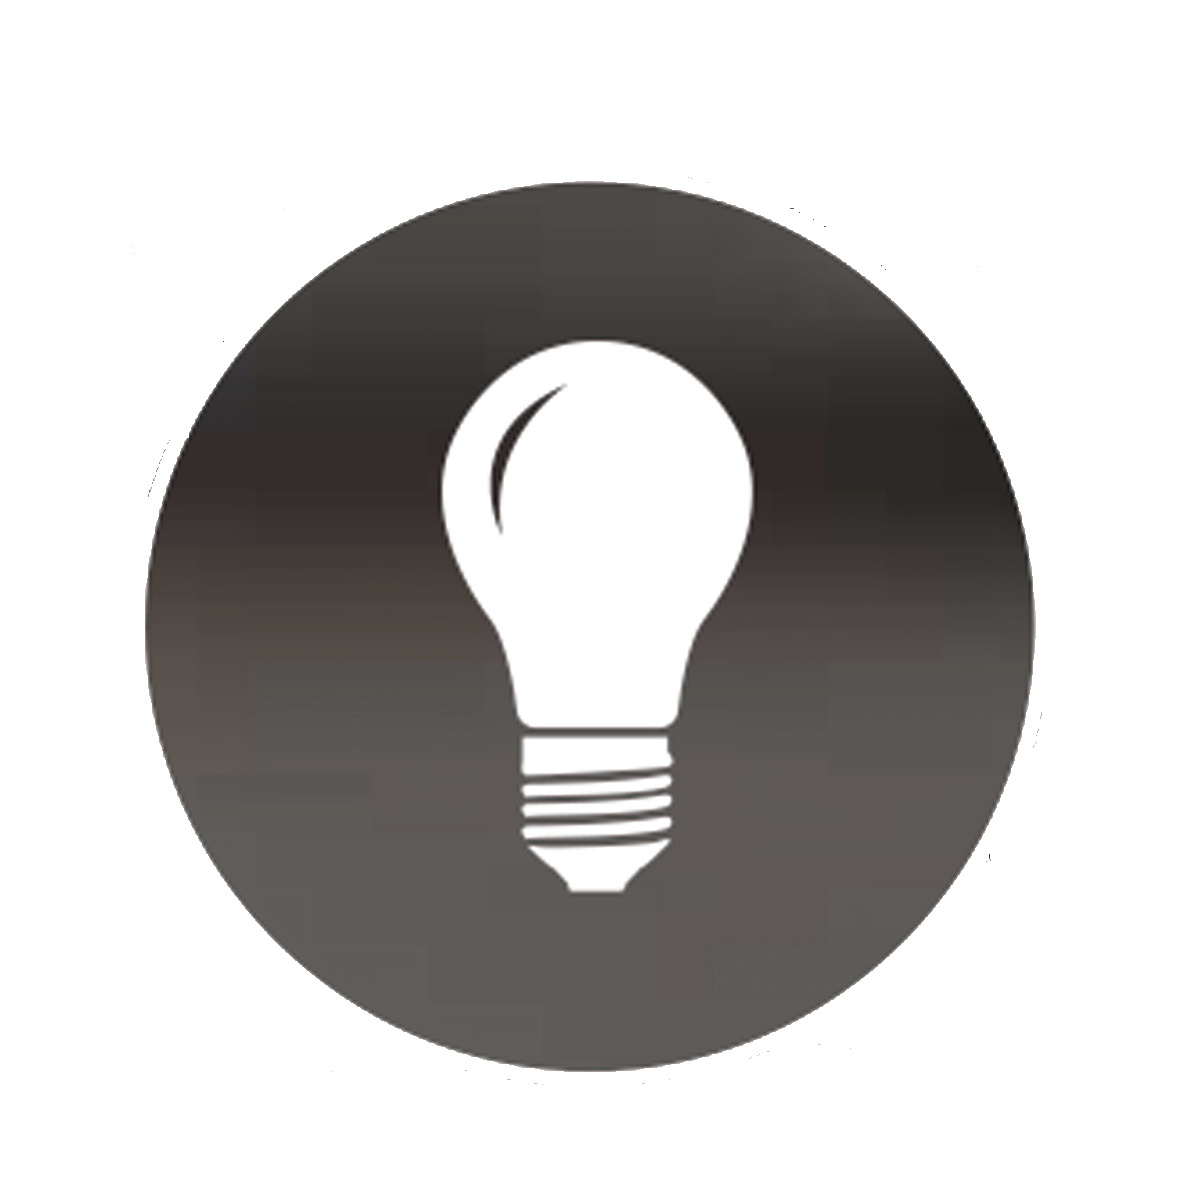 Control intensidad luces